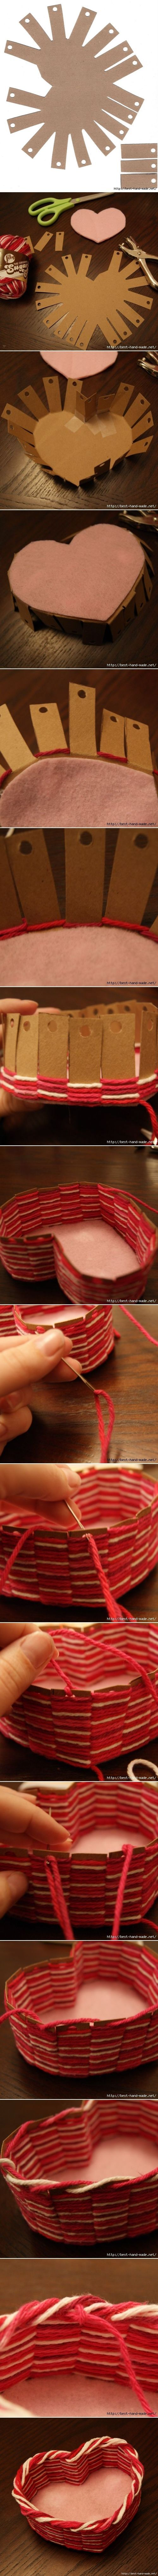 Yarn heart basket tutorial: